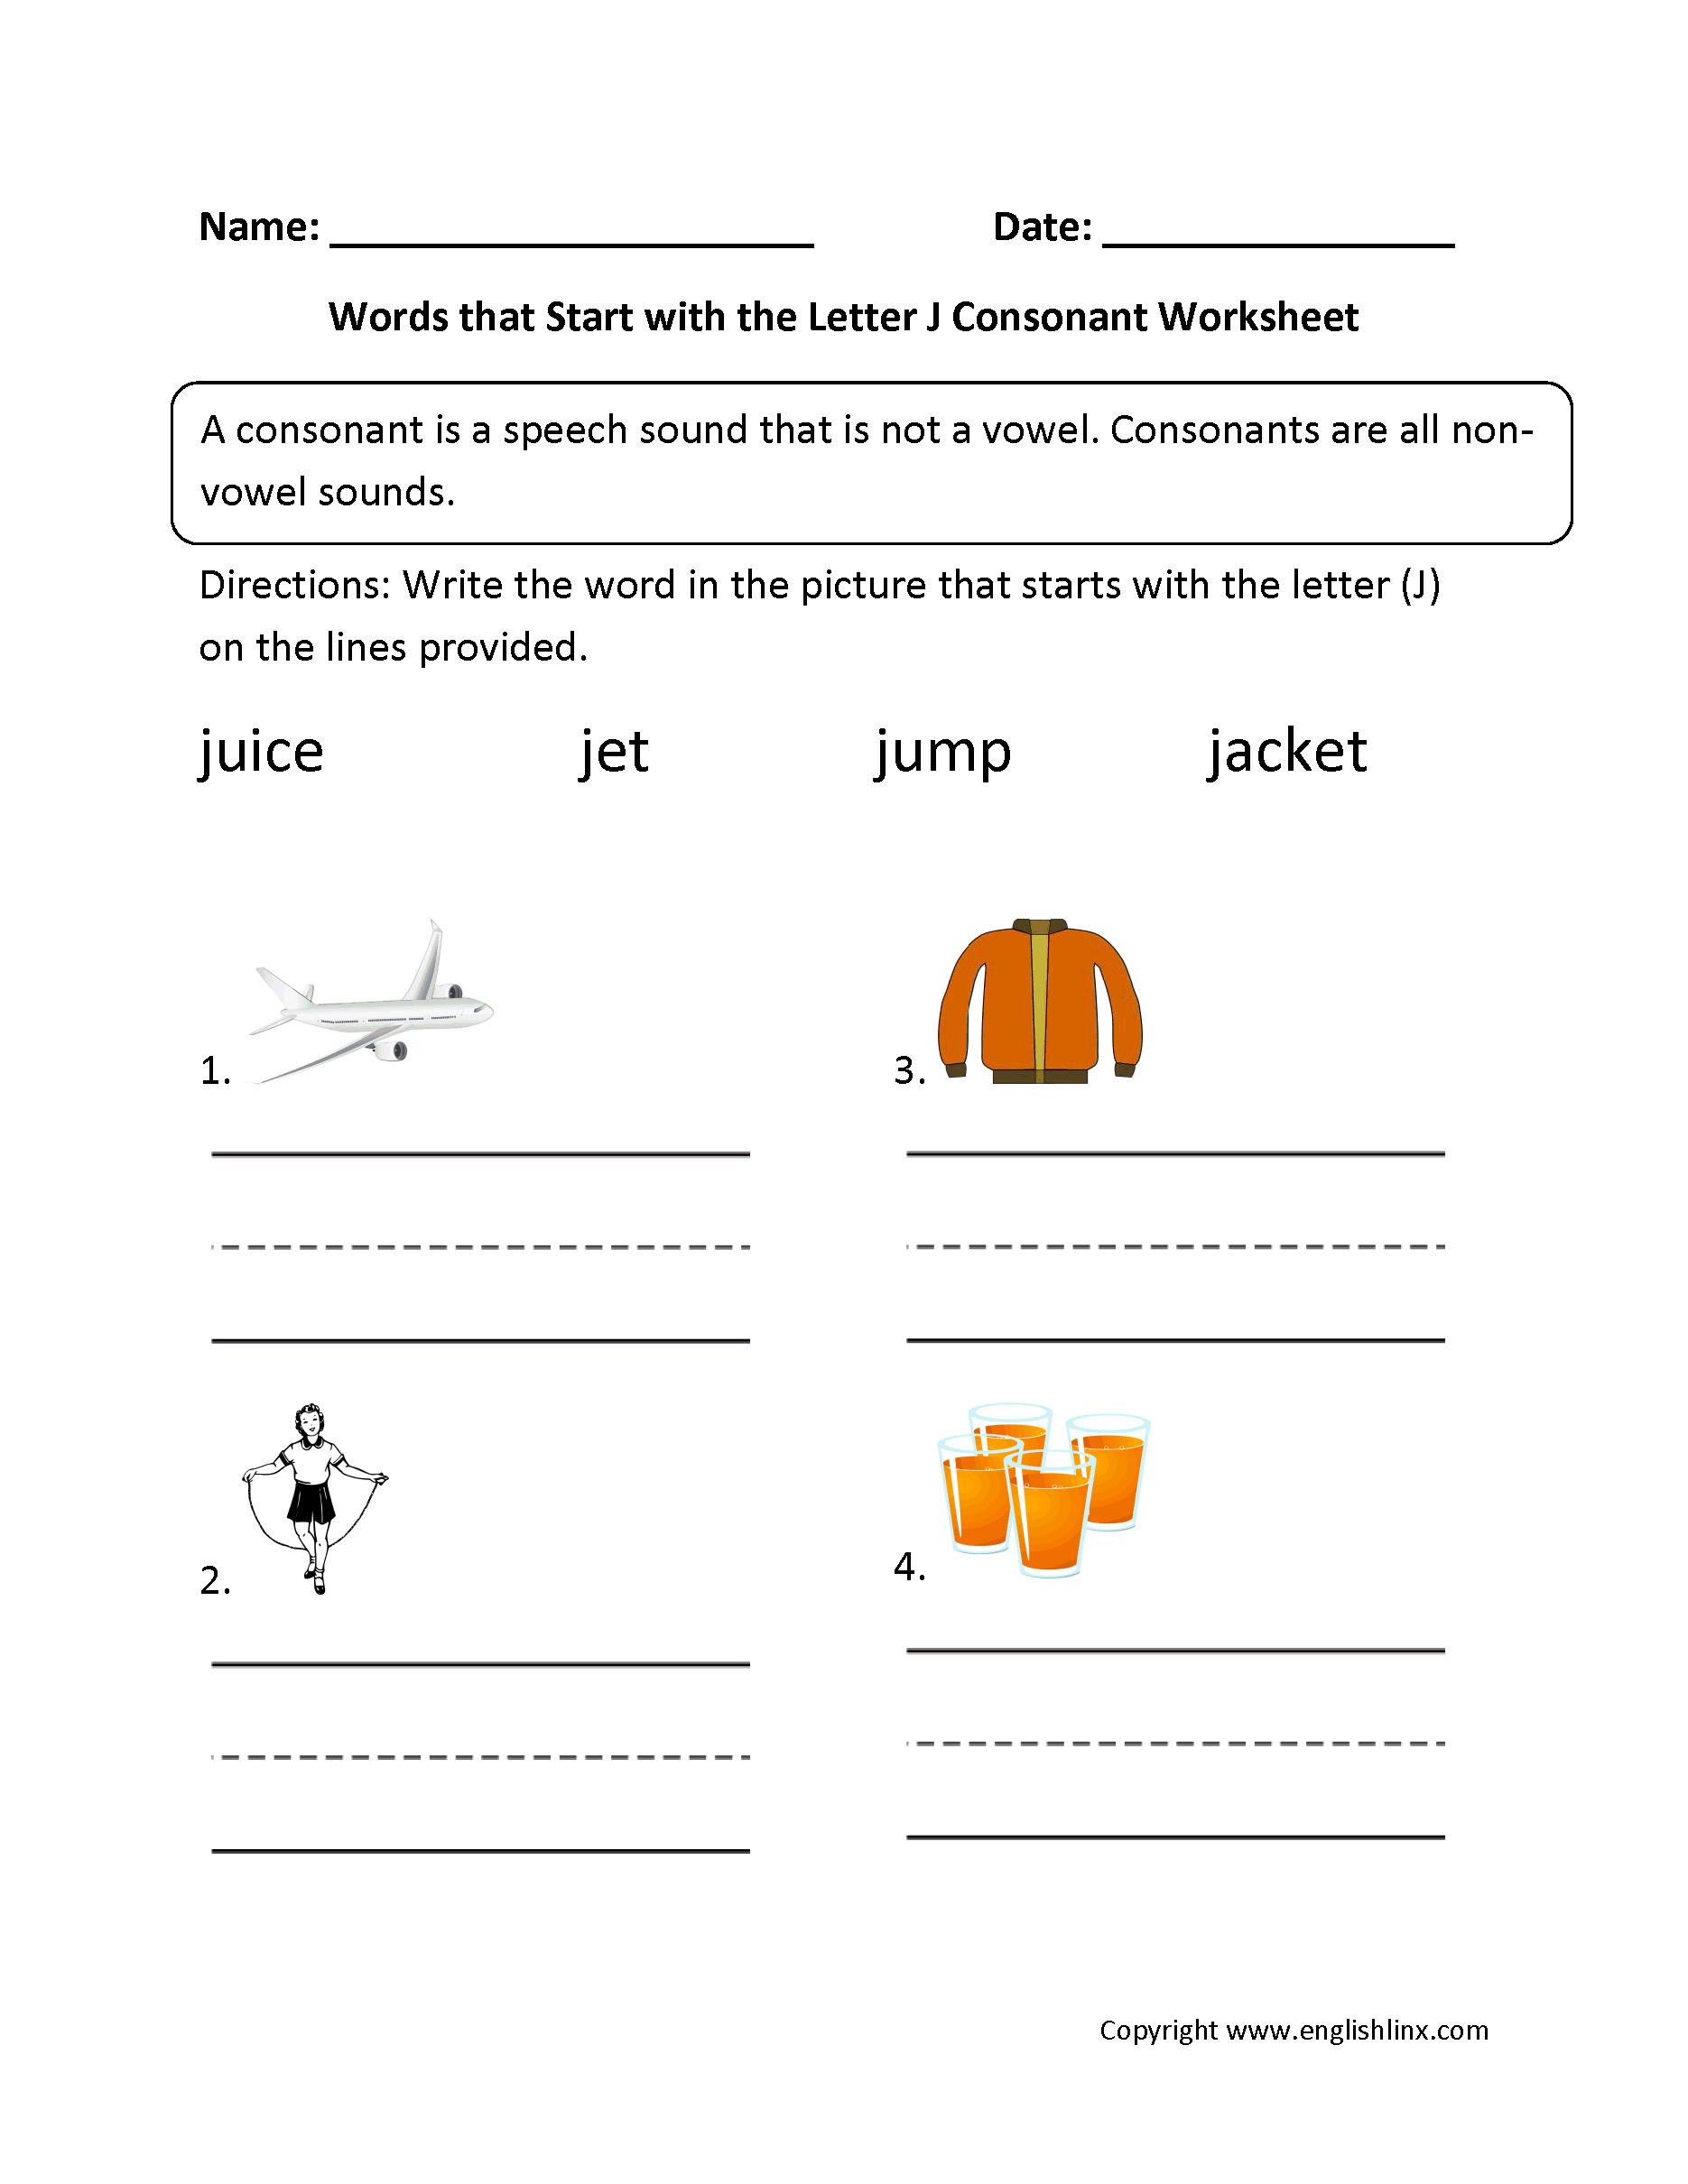 Worksheets Beginning Phonics Worksheets worksheet phonics sounds worksheets yaqutlab free consonant worksheets